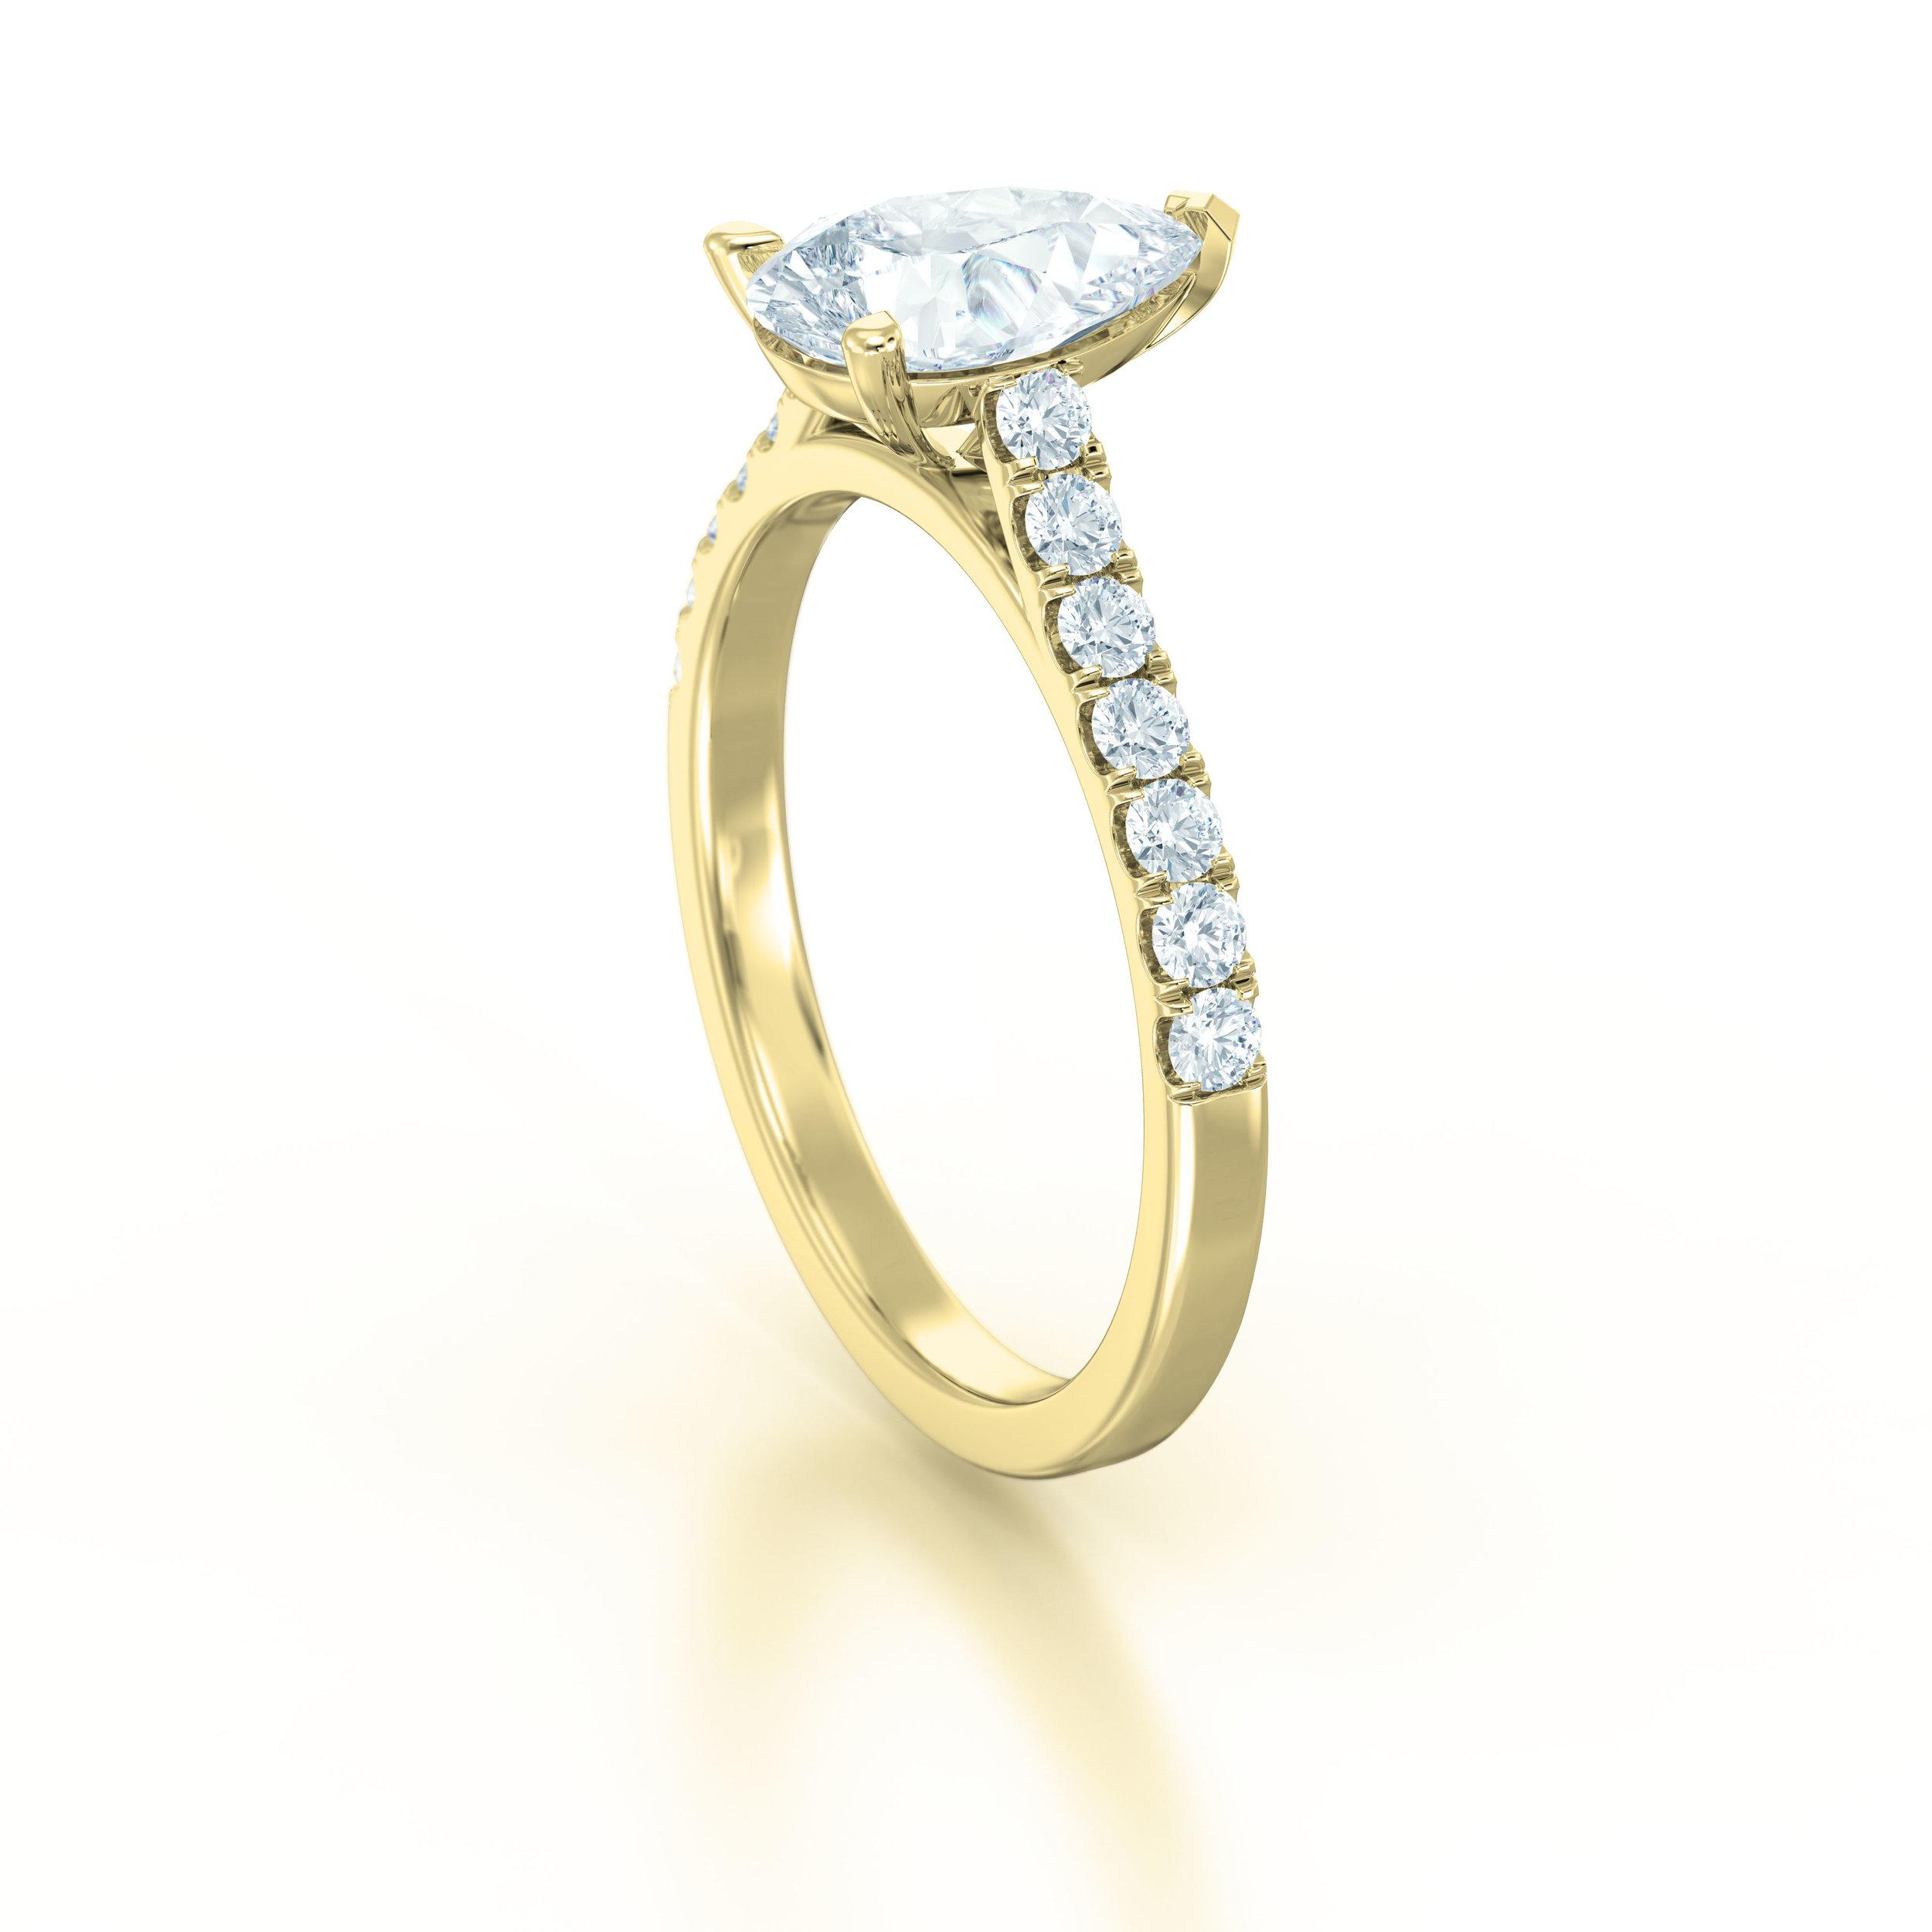 Pear shape diamond shoulder engagement ring